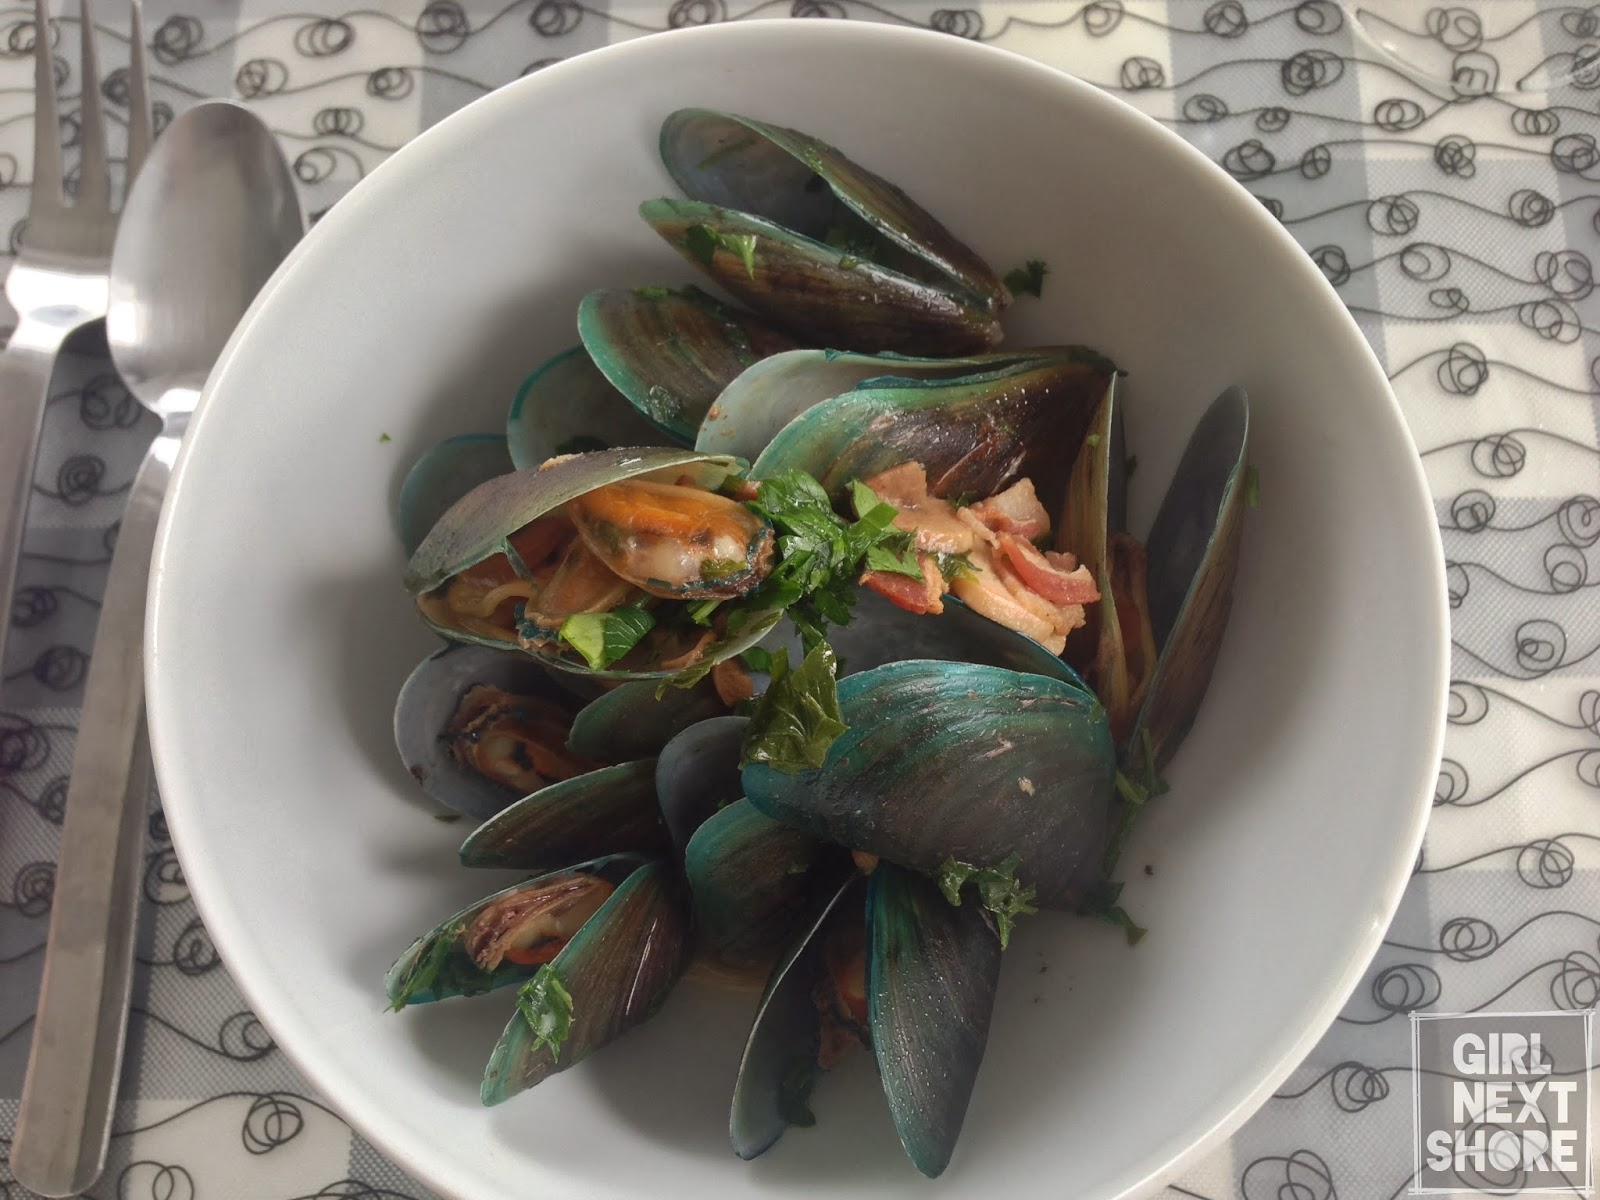 Chez Plaid Boy: where I found my heart on a plate